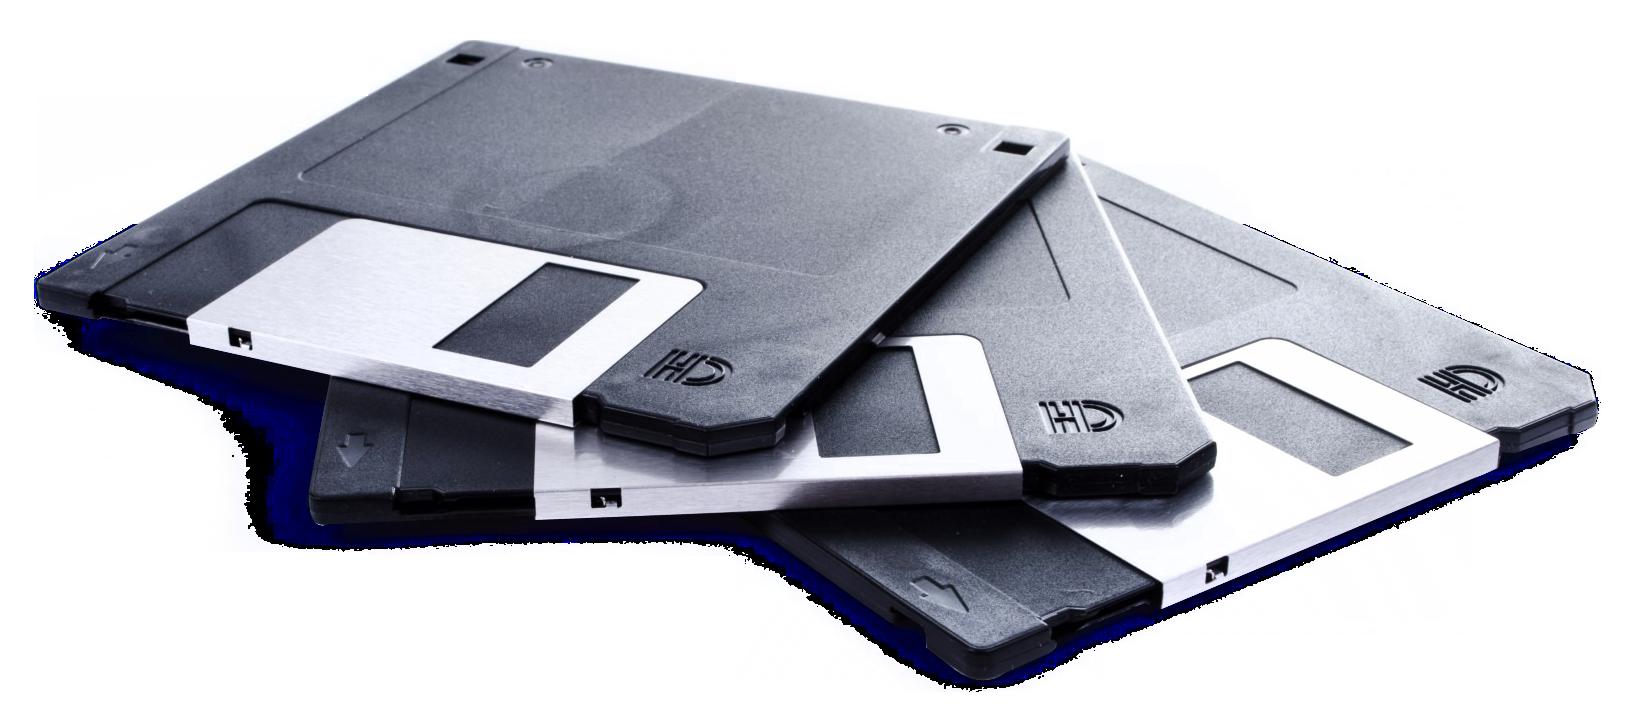 Floppy Disk Png Image Floppy Disk Floppy Disk